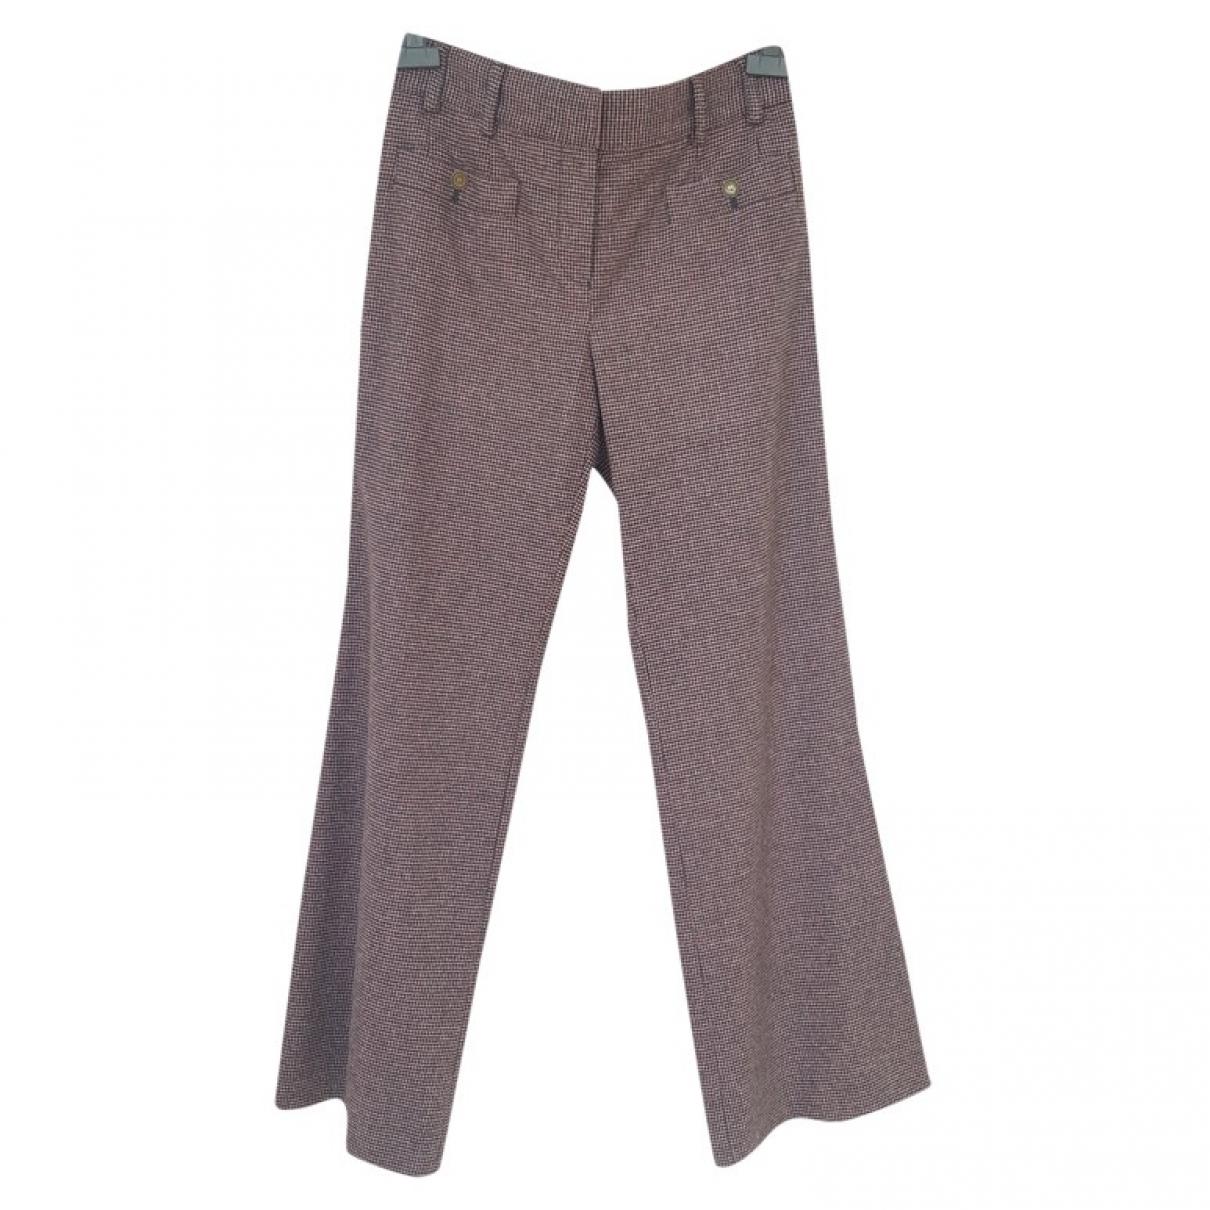 Chanel \N Burgundy Wool Trousers for Women 38 FR